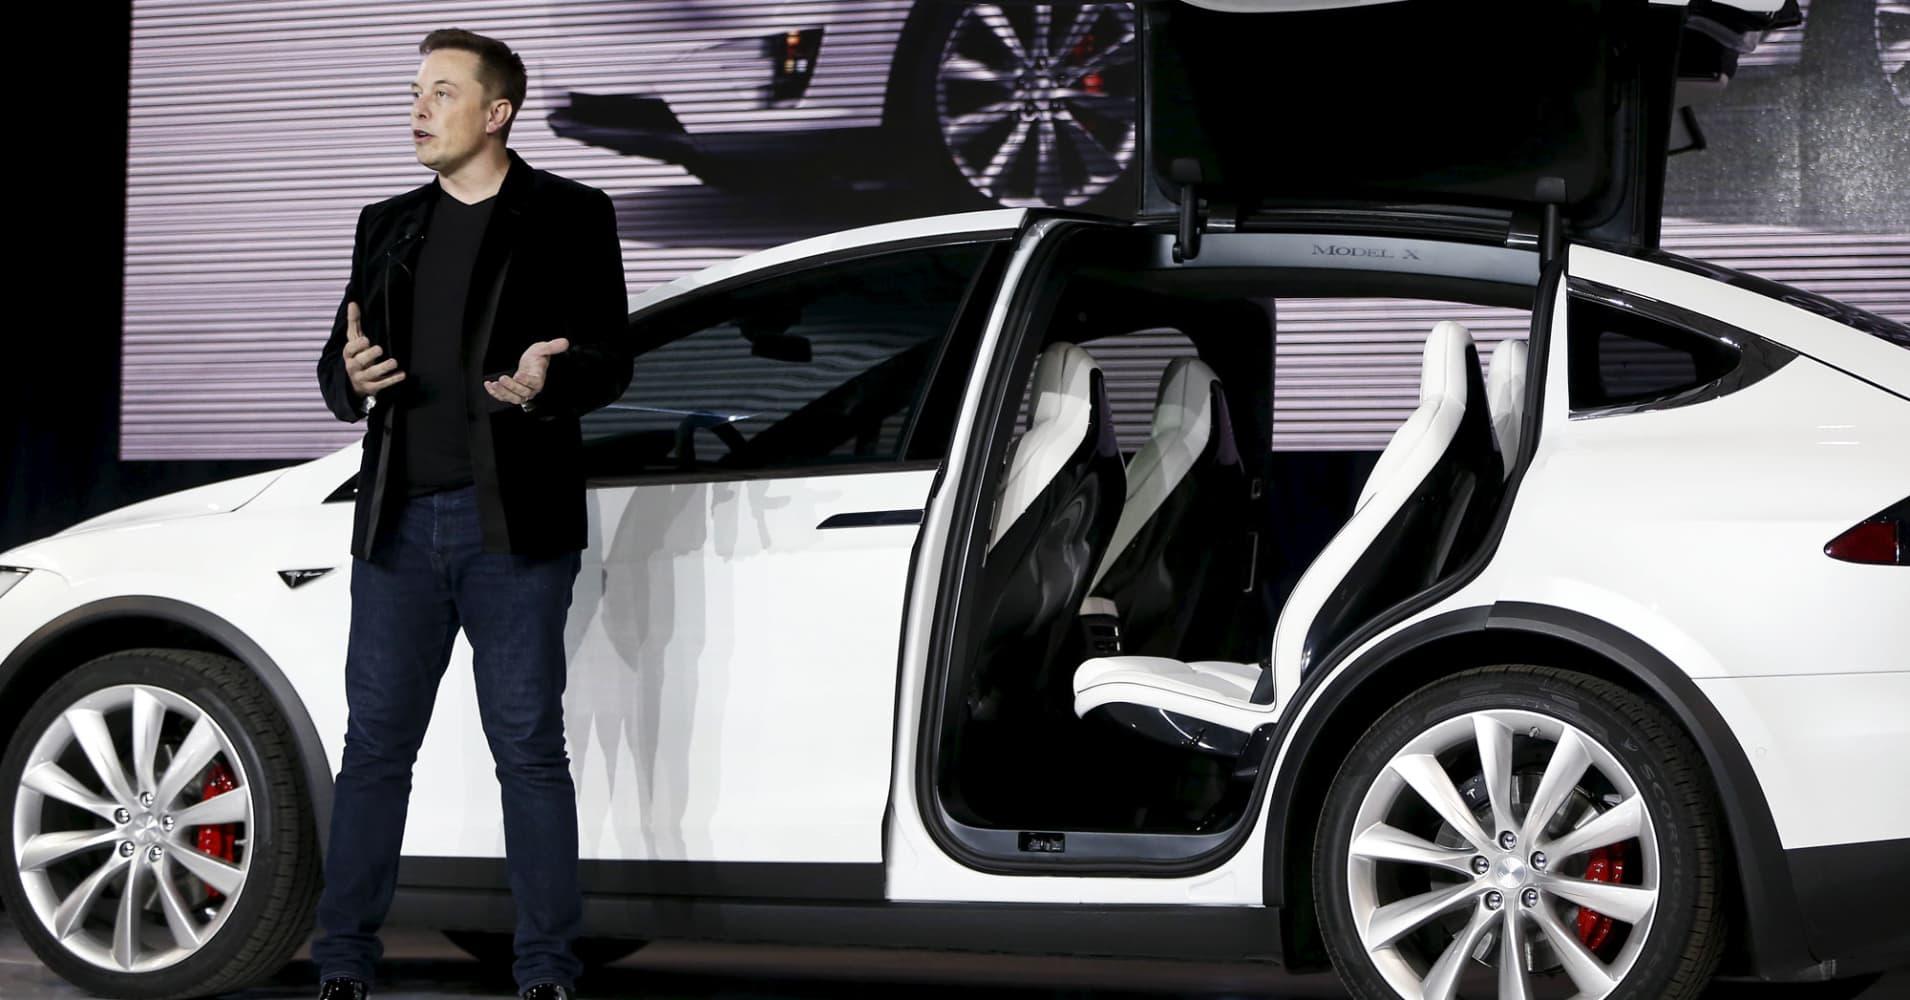 Tesla Motors Ceo Elon Musk Introduces The Falcon Wing Door On Model X